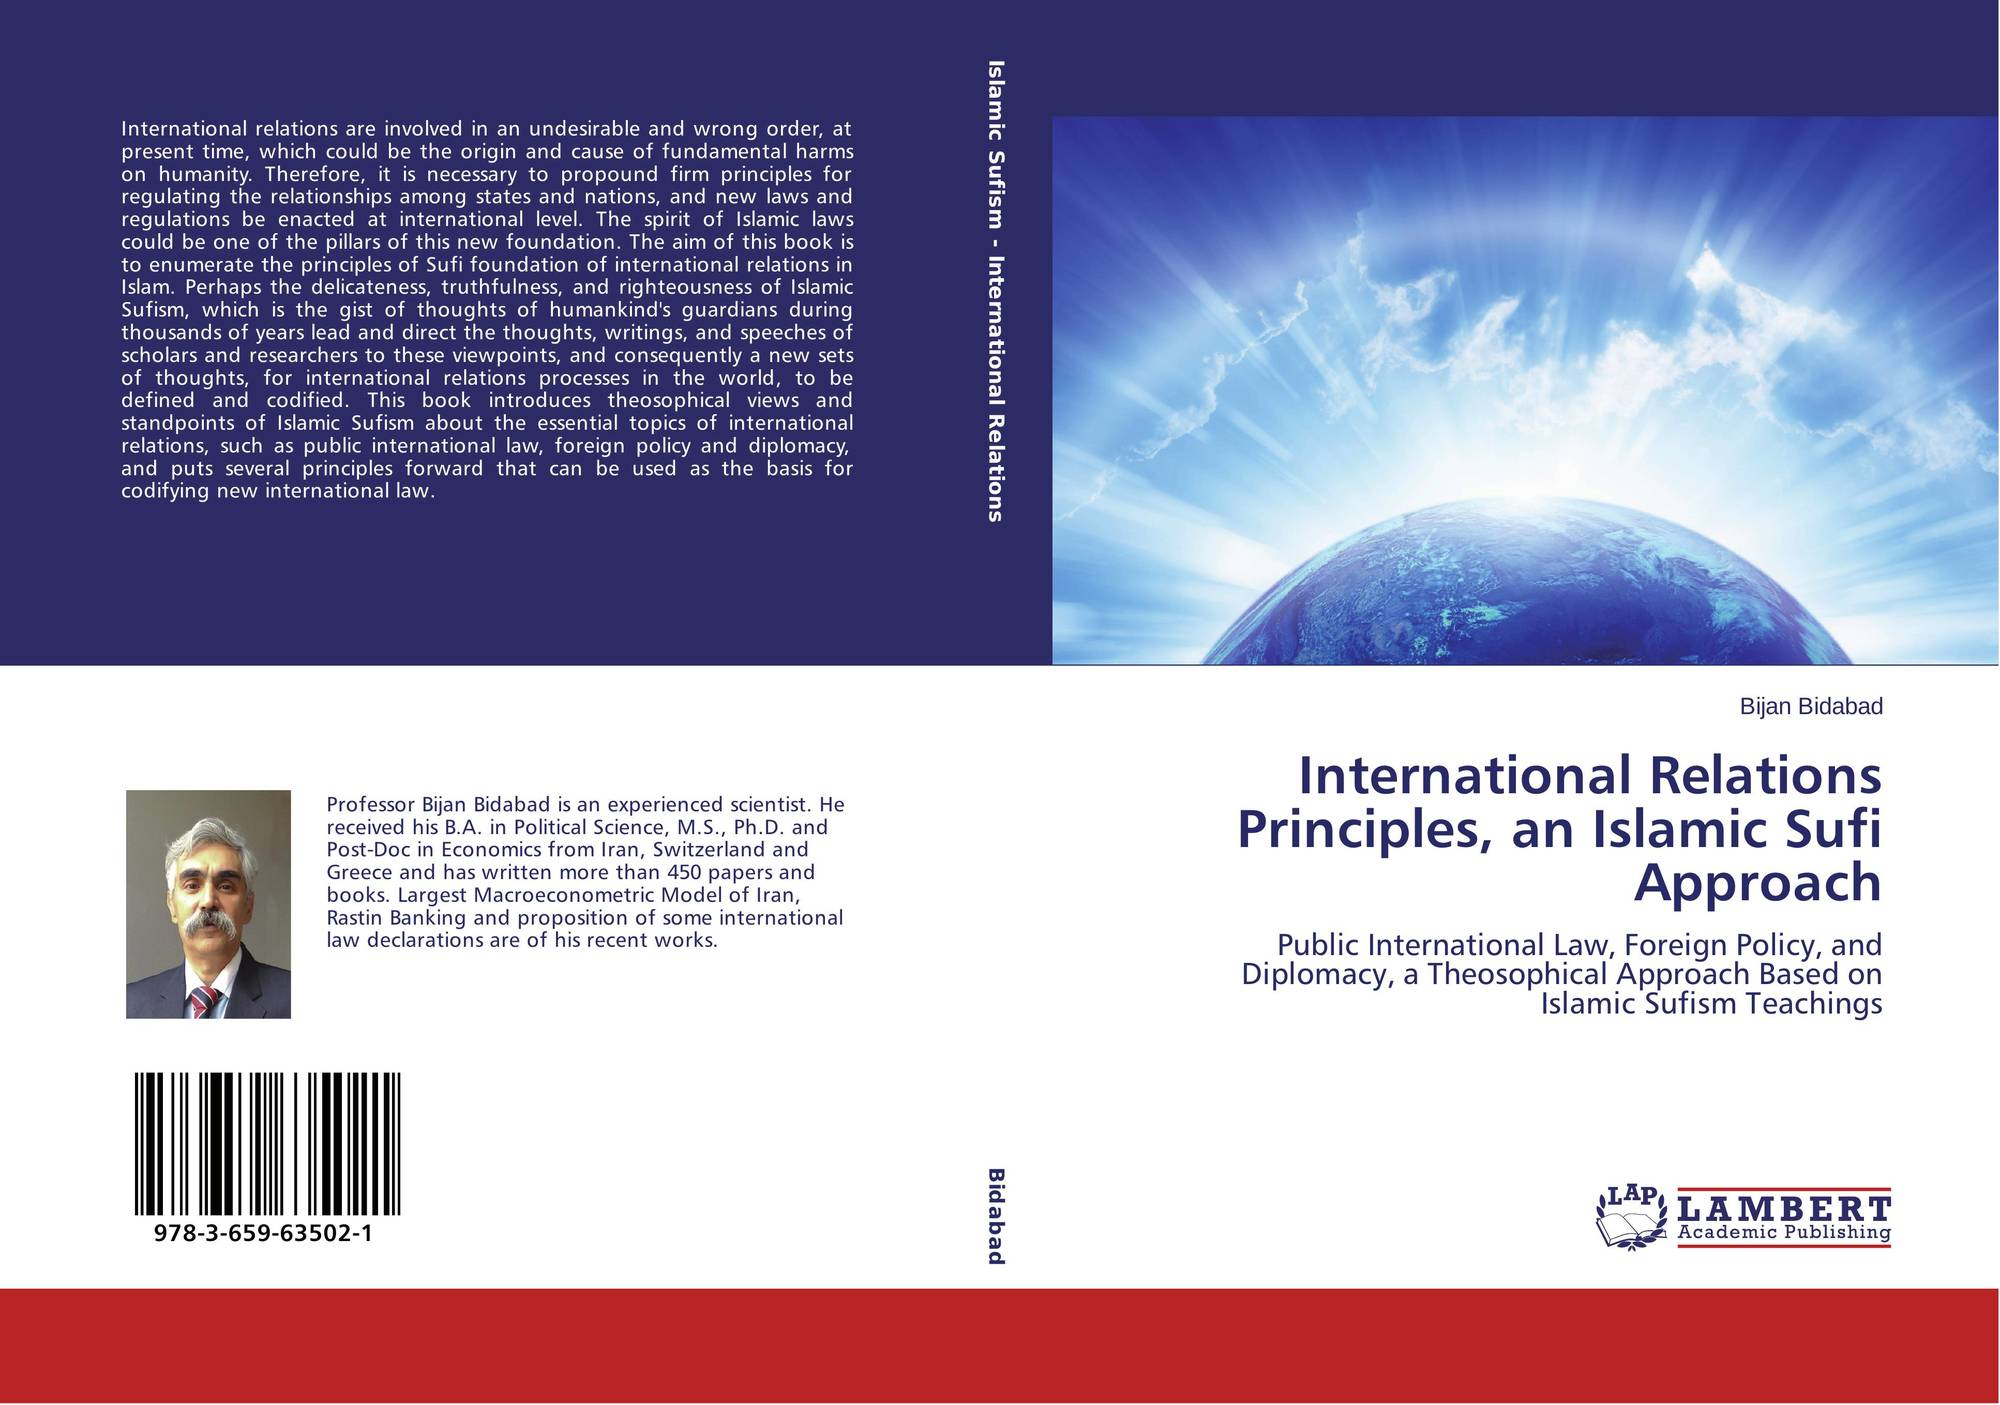 International Relations Principles, an Islamic Sufi Approach